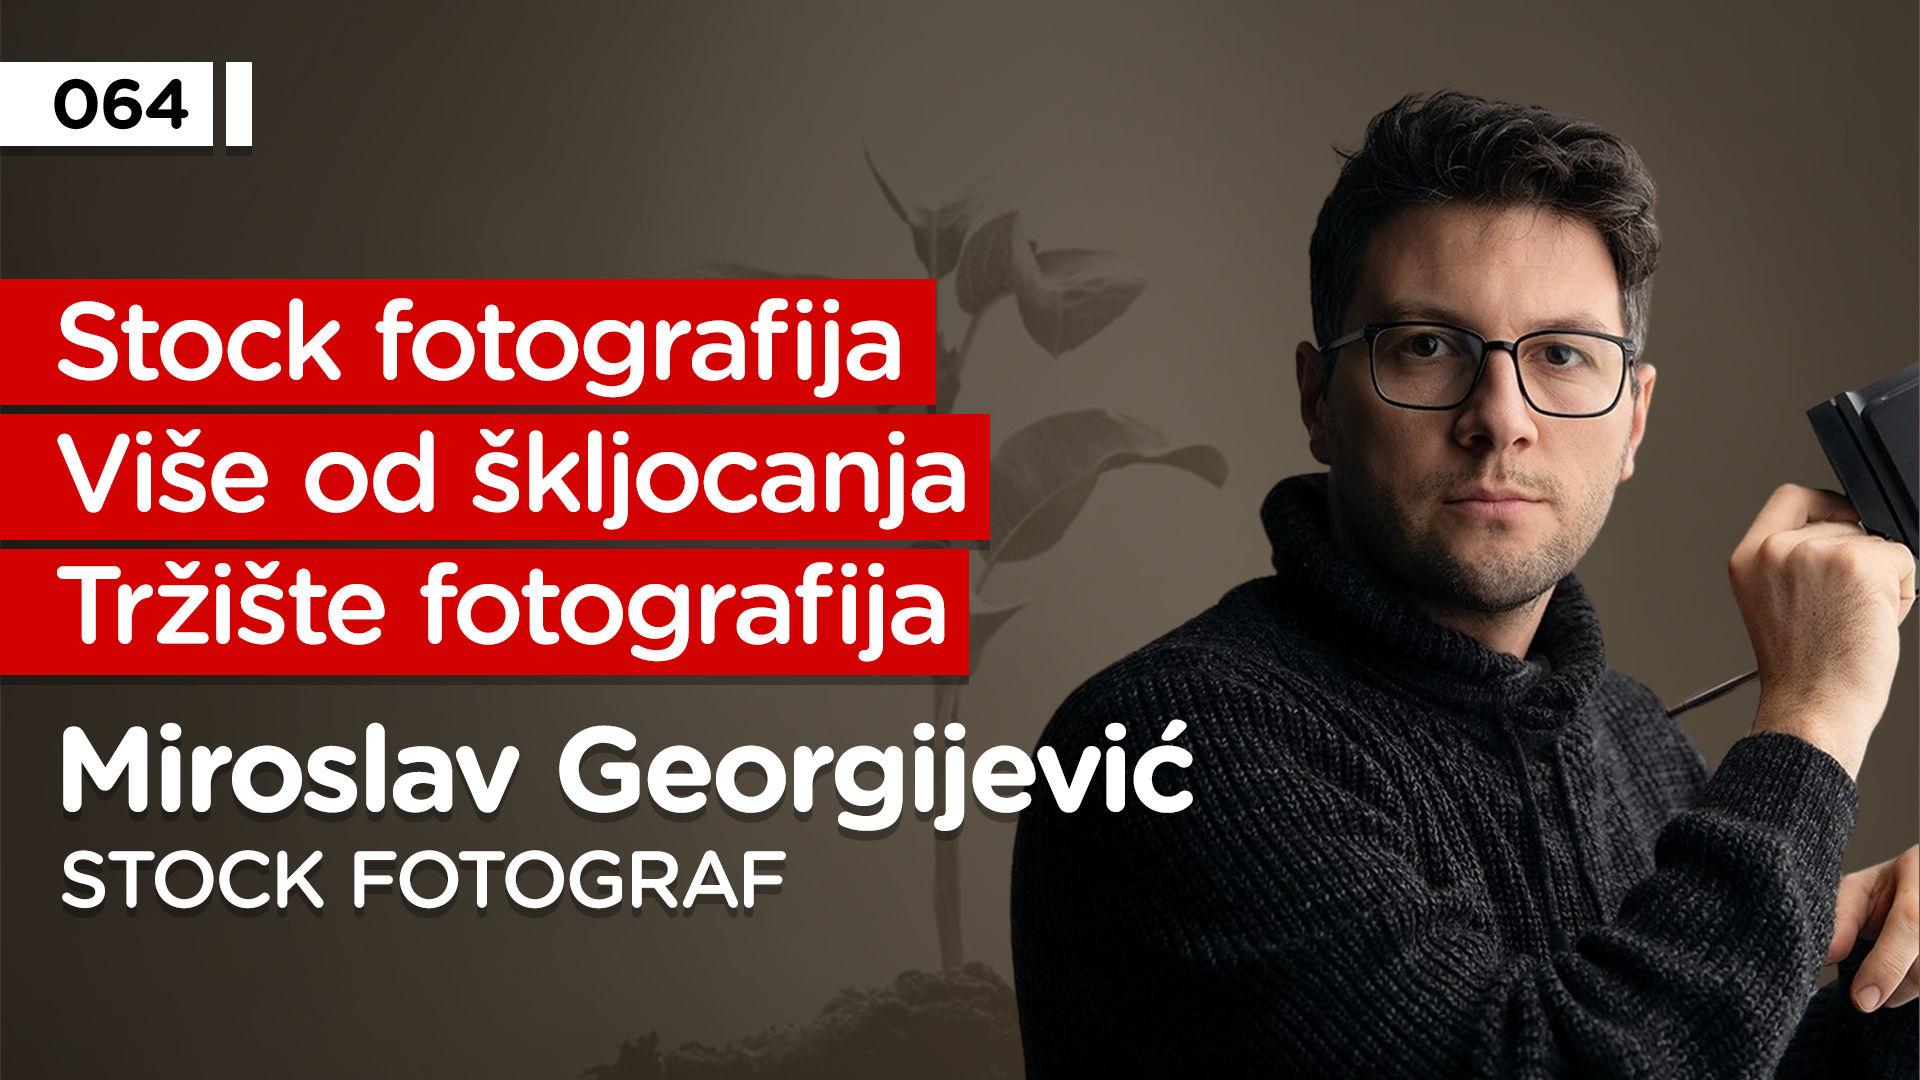 EP064: Miroslav Georgijević